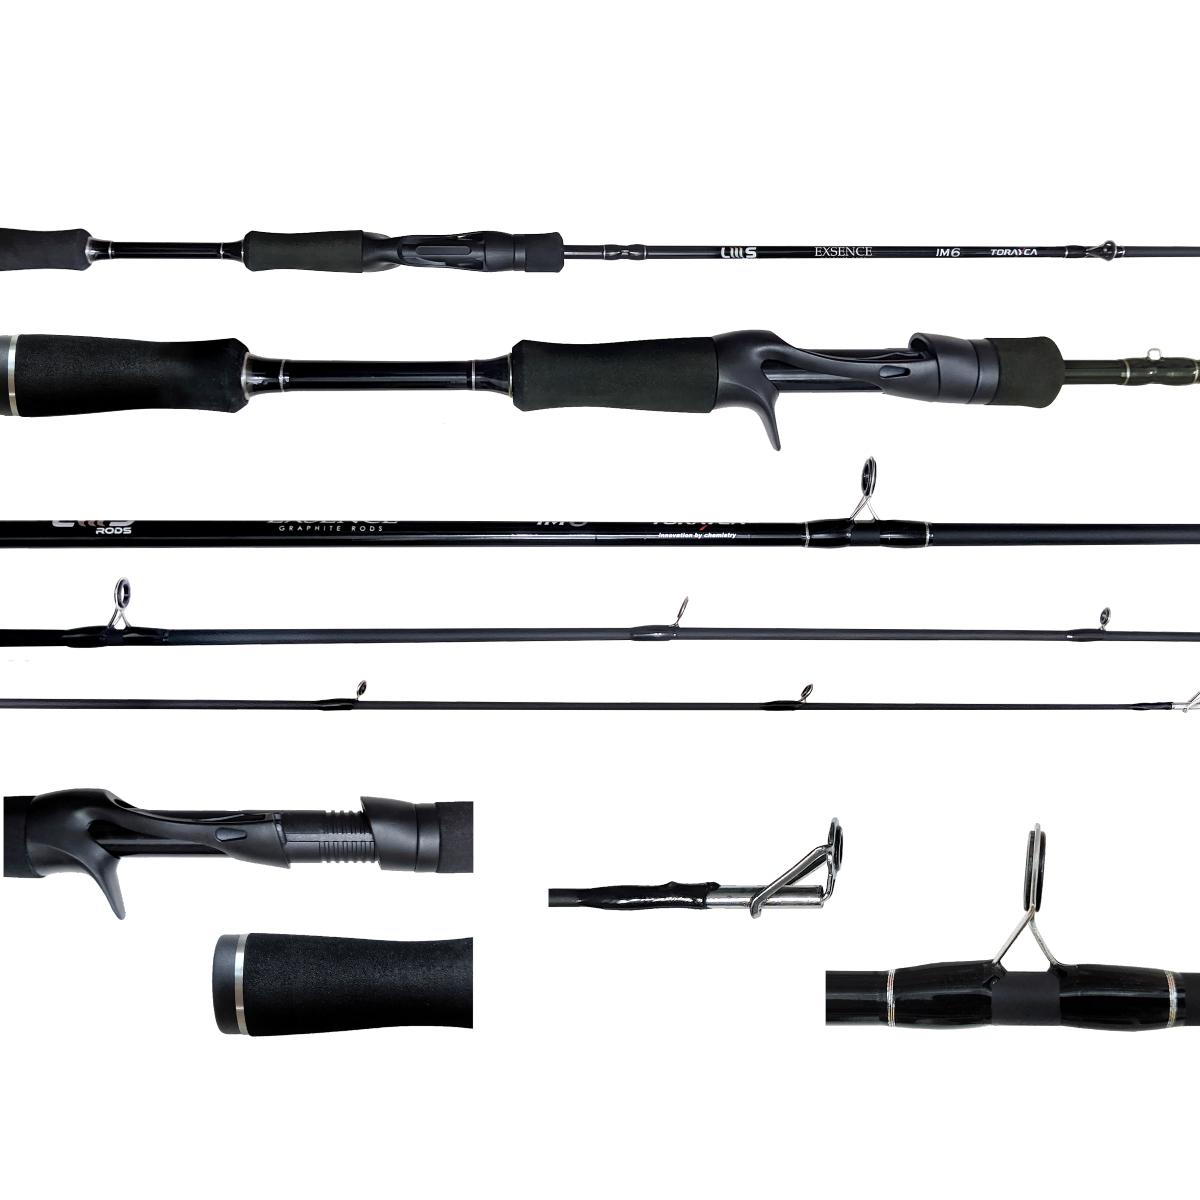 Vara Lumis Exsence 602 (1,83m) 10-25 lbs P/ Carretilha 2 Partes  - Pesca Adventure